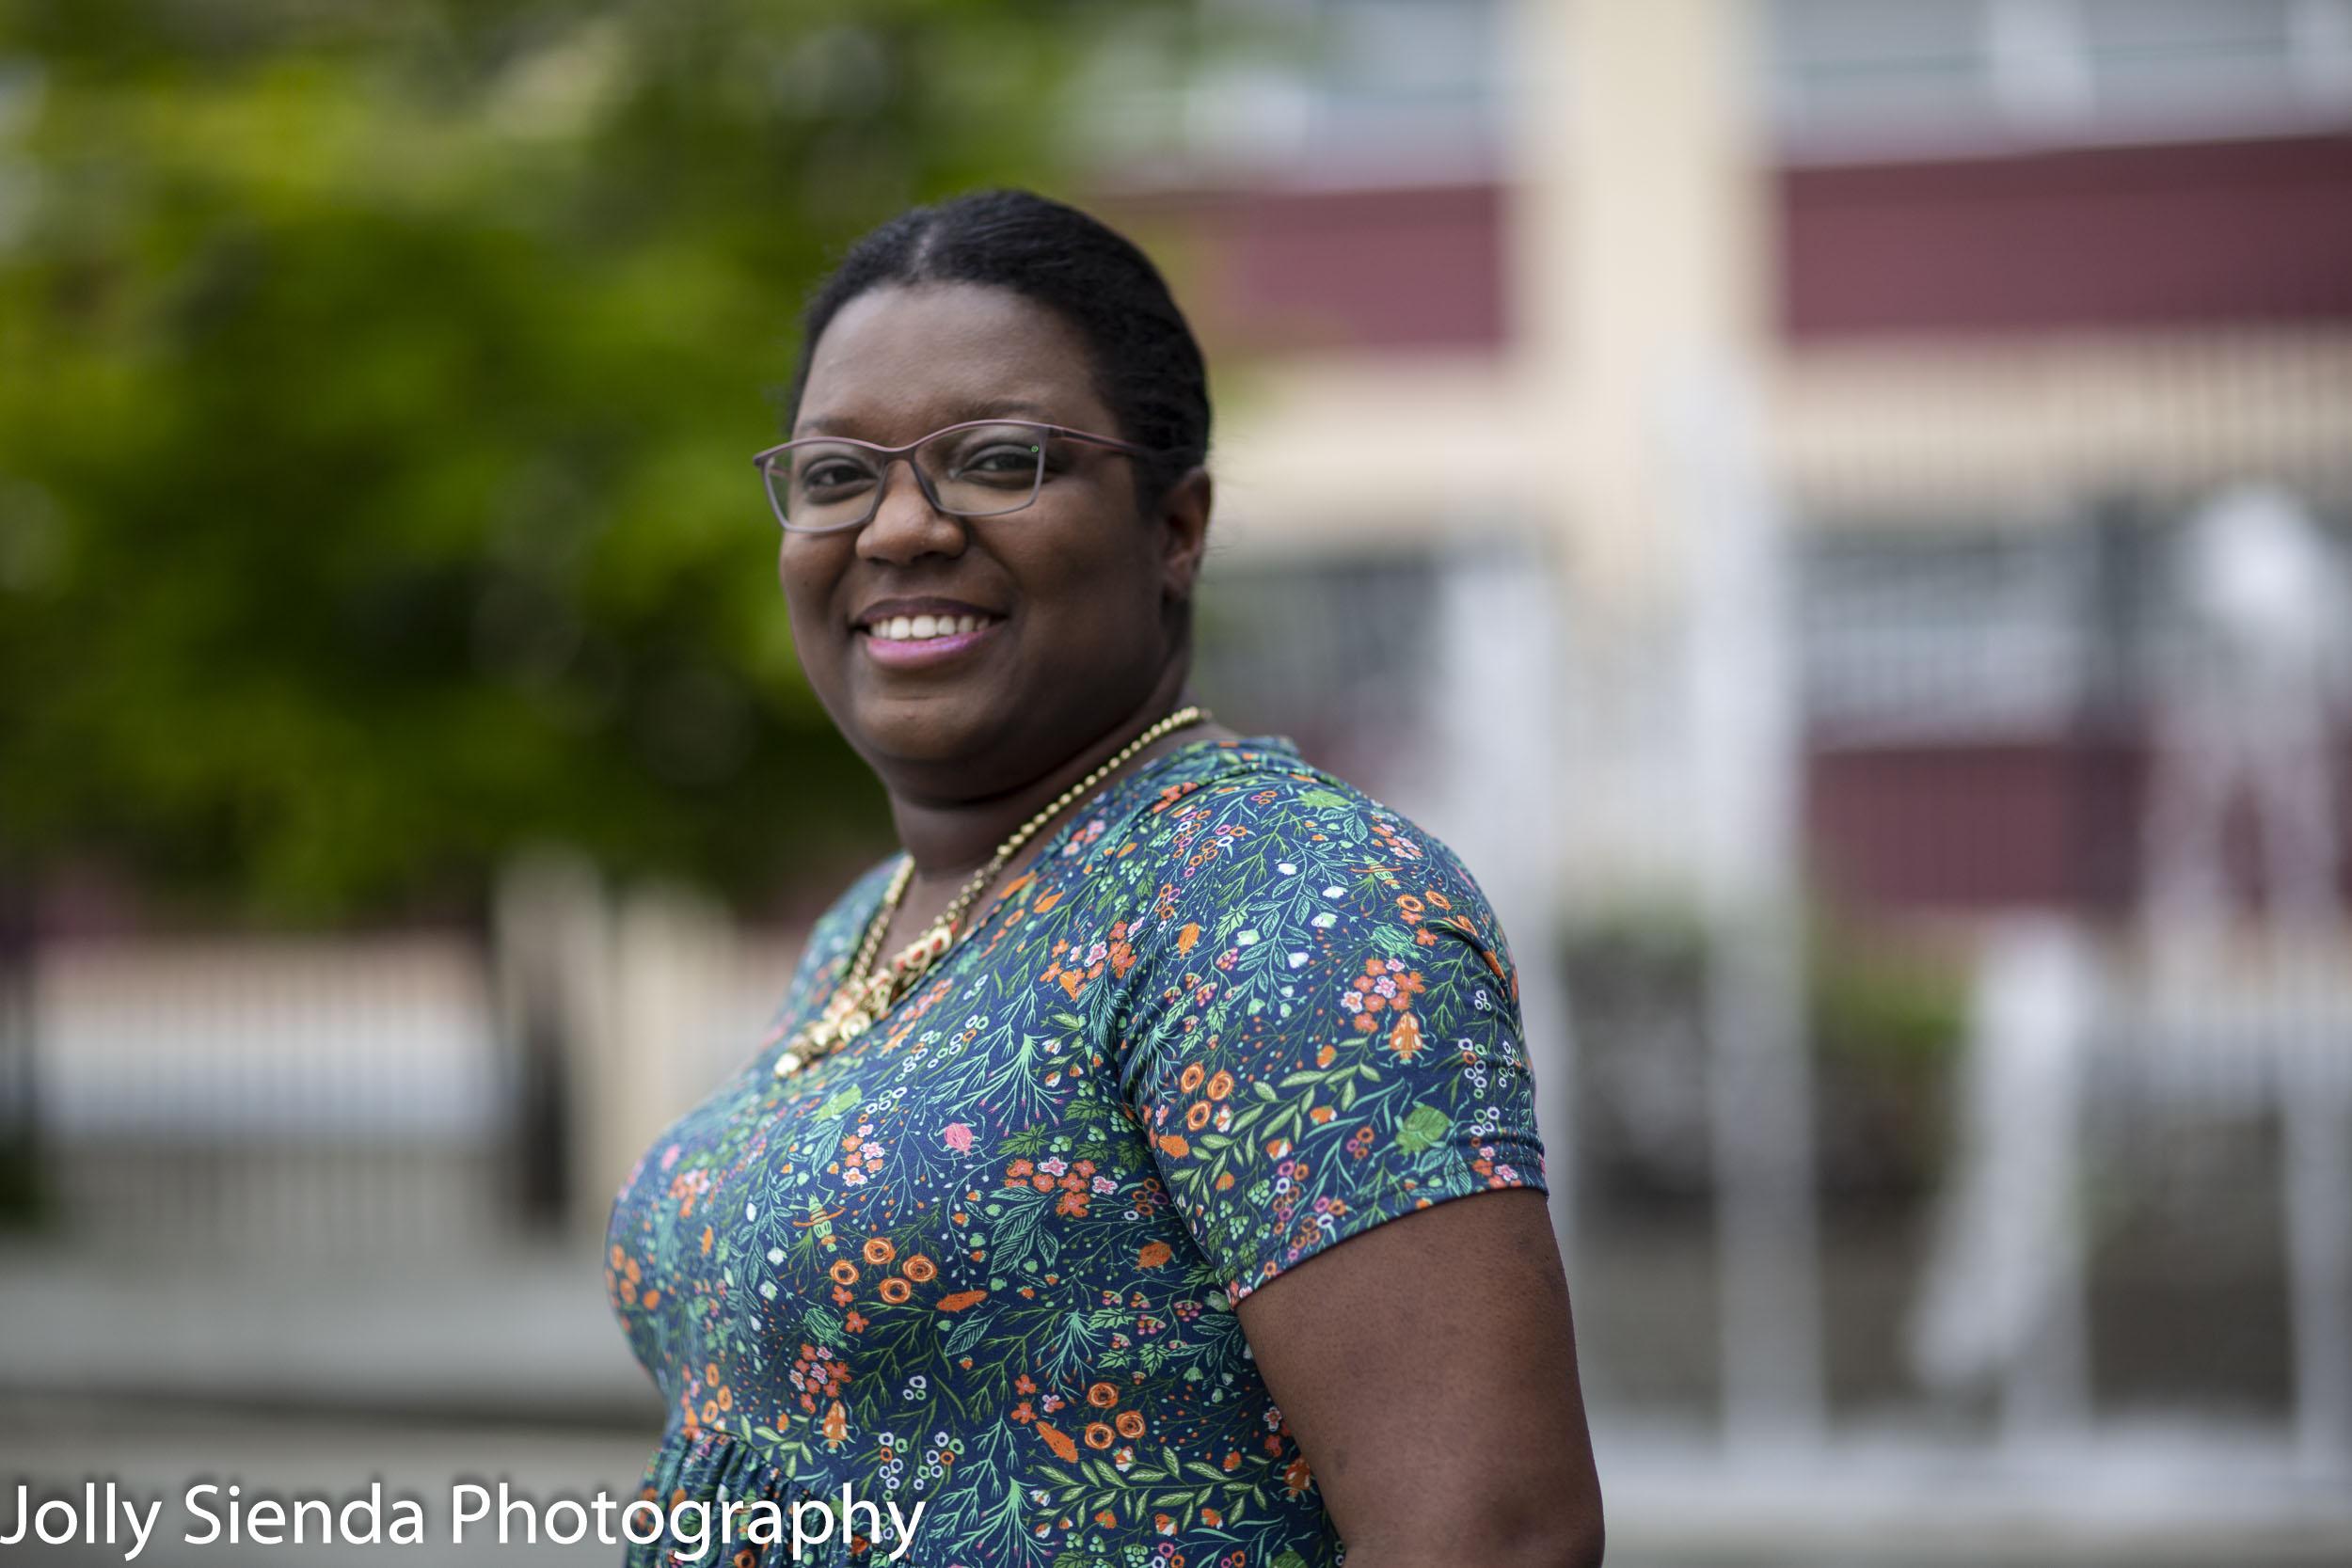 Kaneesah Roarke, Excelsior College Alumni, Jolly Sienda Photography, Bremerton, Washington, USA.